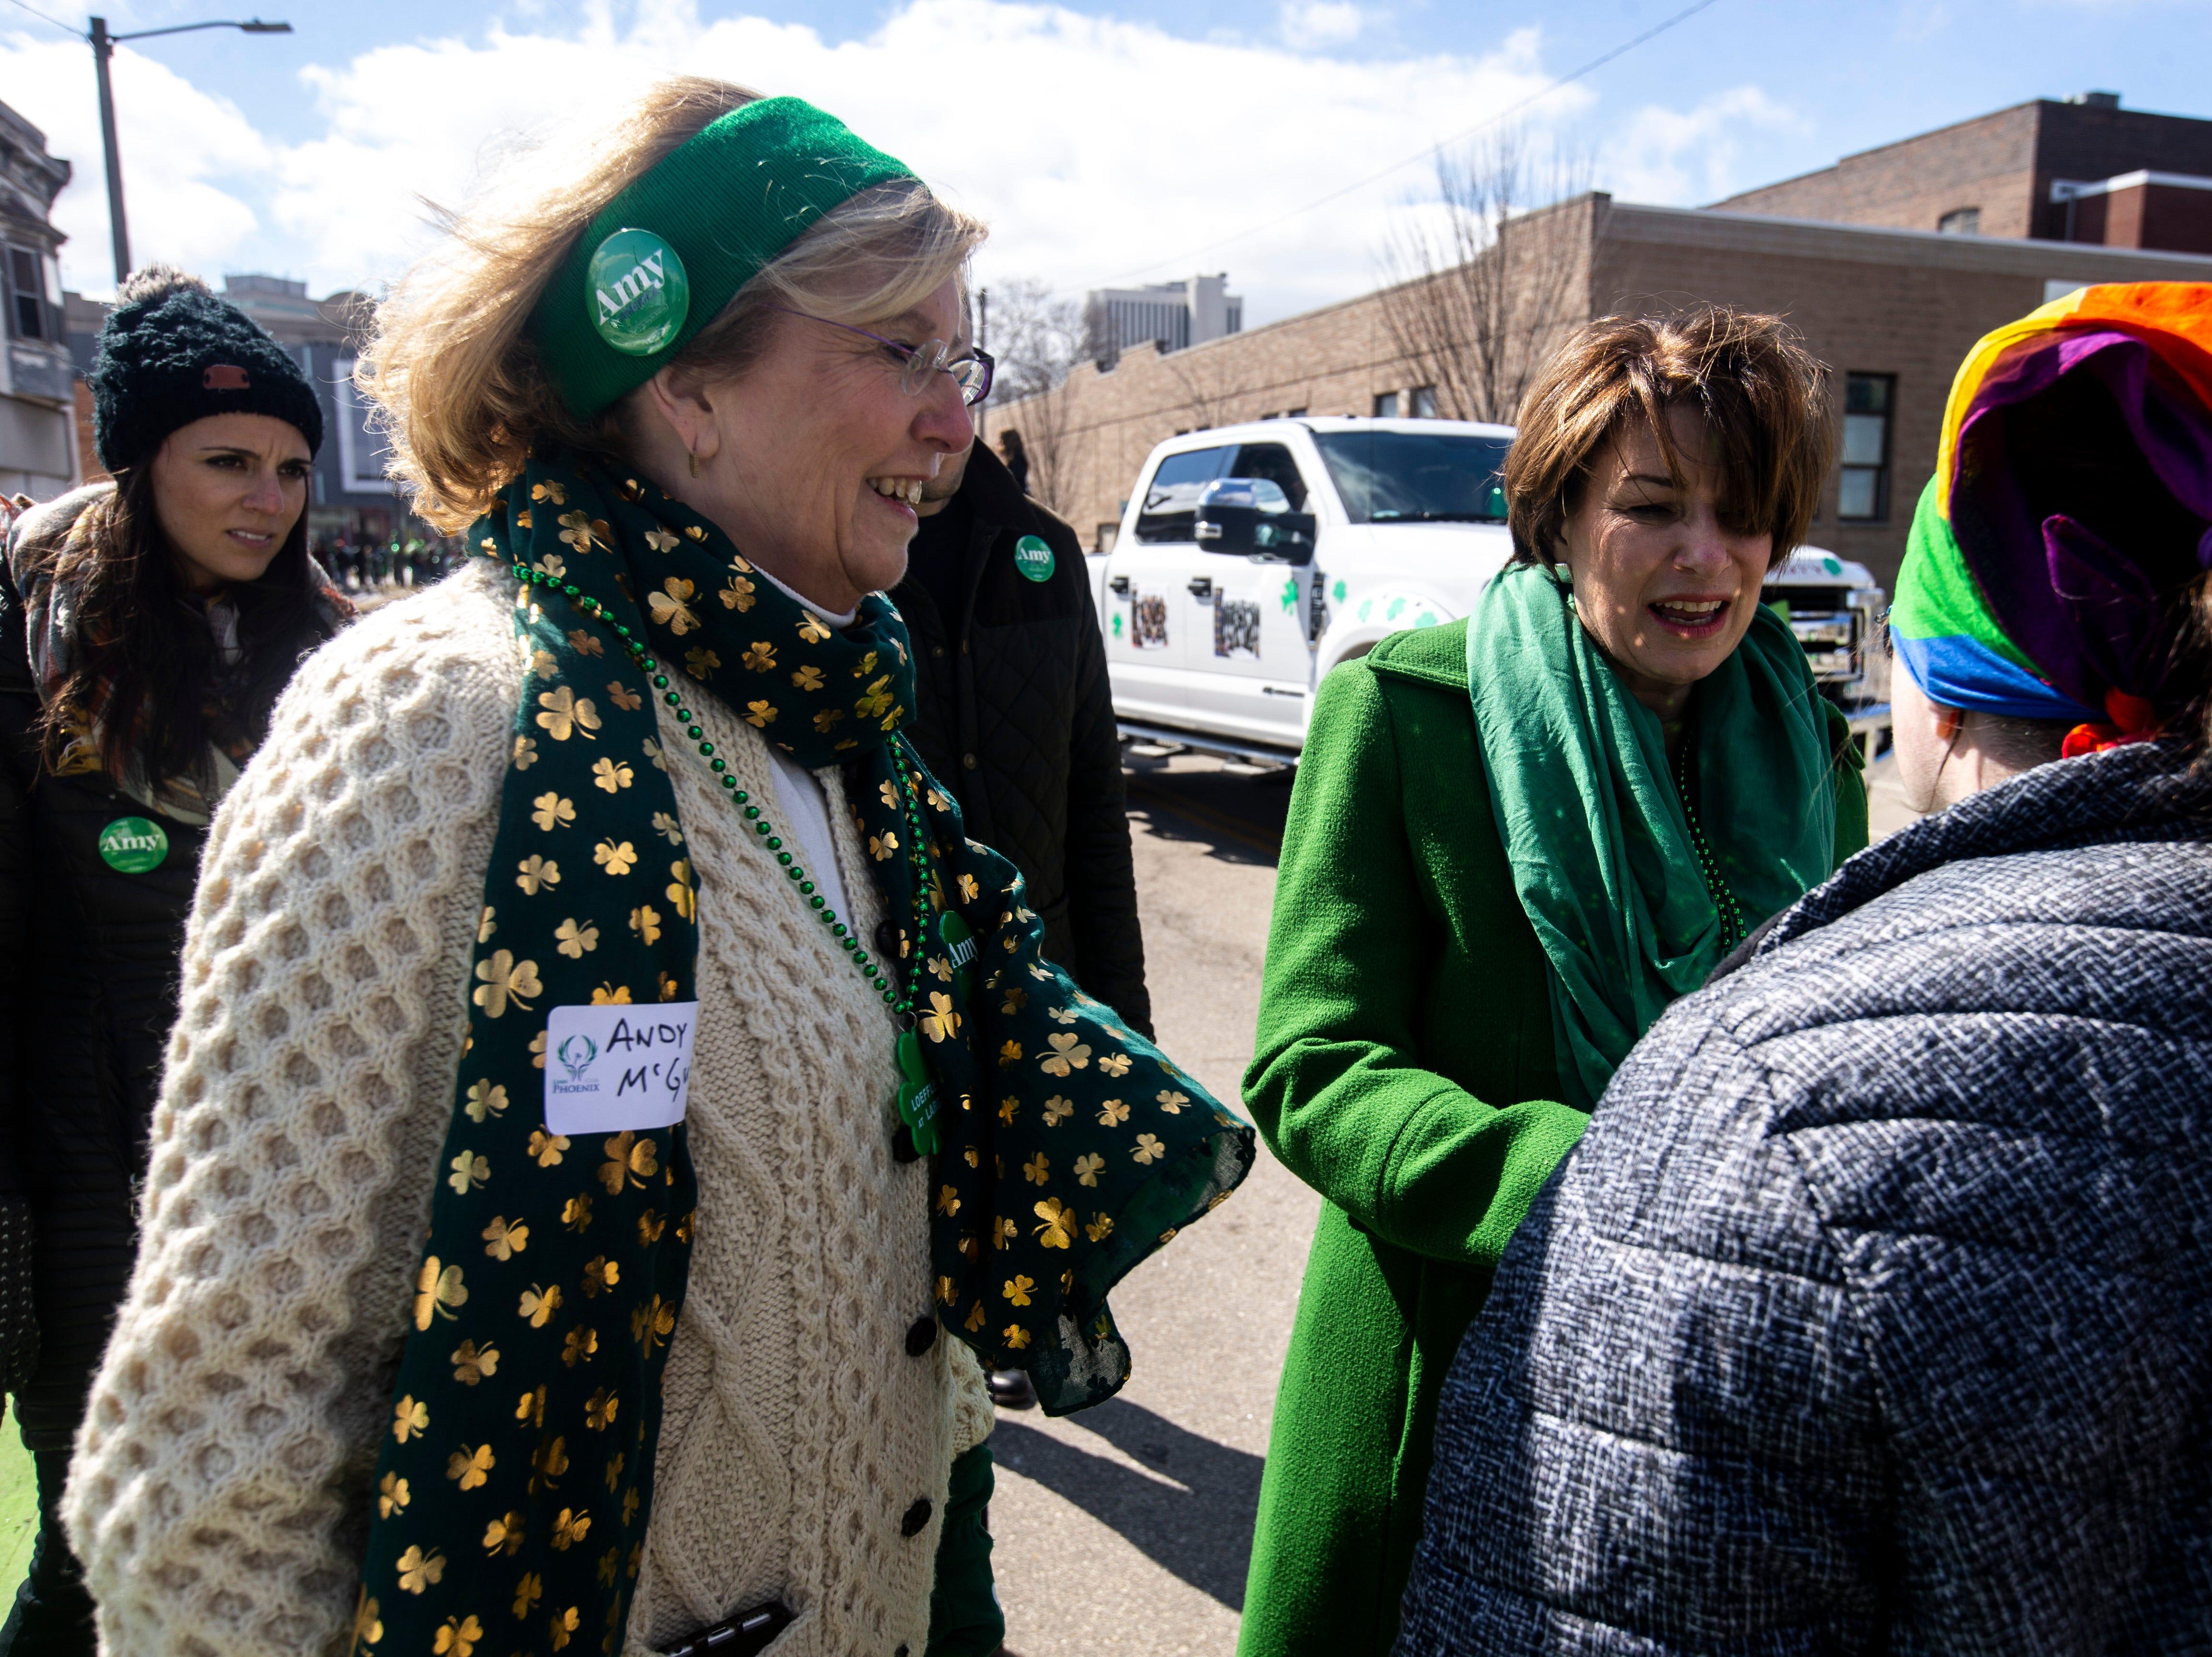 U.S. Sen. Amy Klobuchar, D-Minn., talks with residents while walking in the Saint Patrick's Day Parade Society (SaPaDaPaSo) parade on Sunday, March 17, 2019, in downtown Cedar Rapids, Iowa.